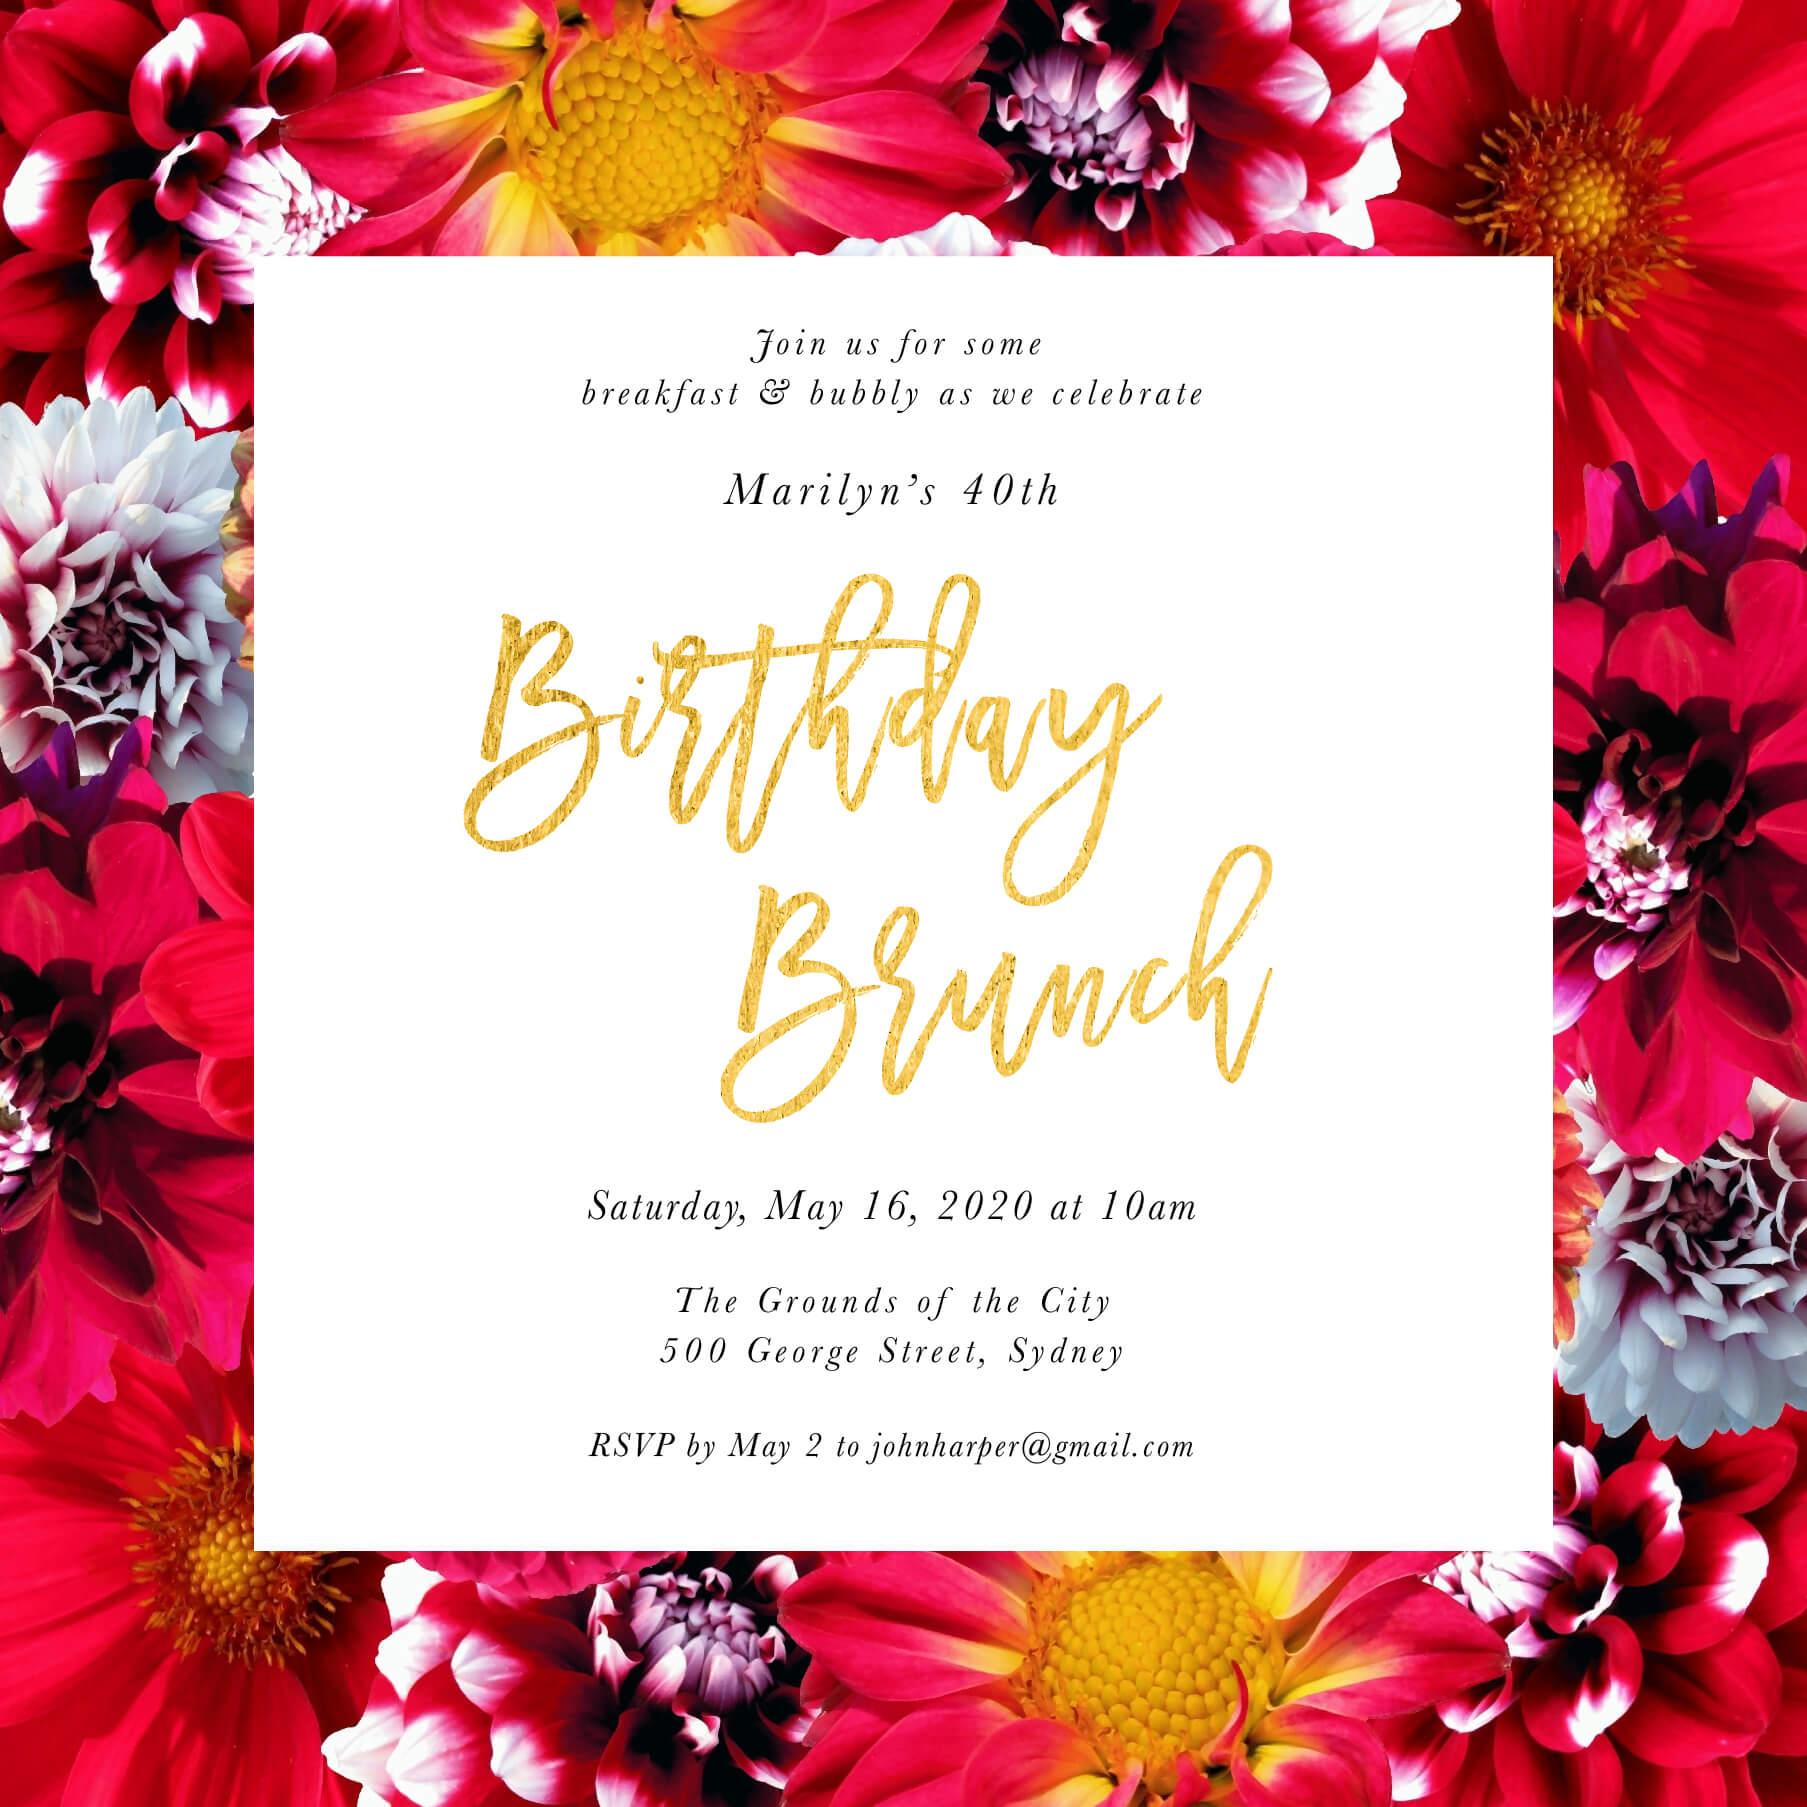 Bloom - Birthday Invitations